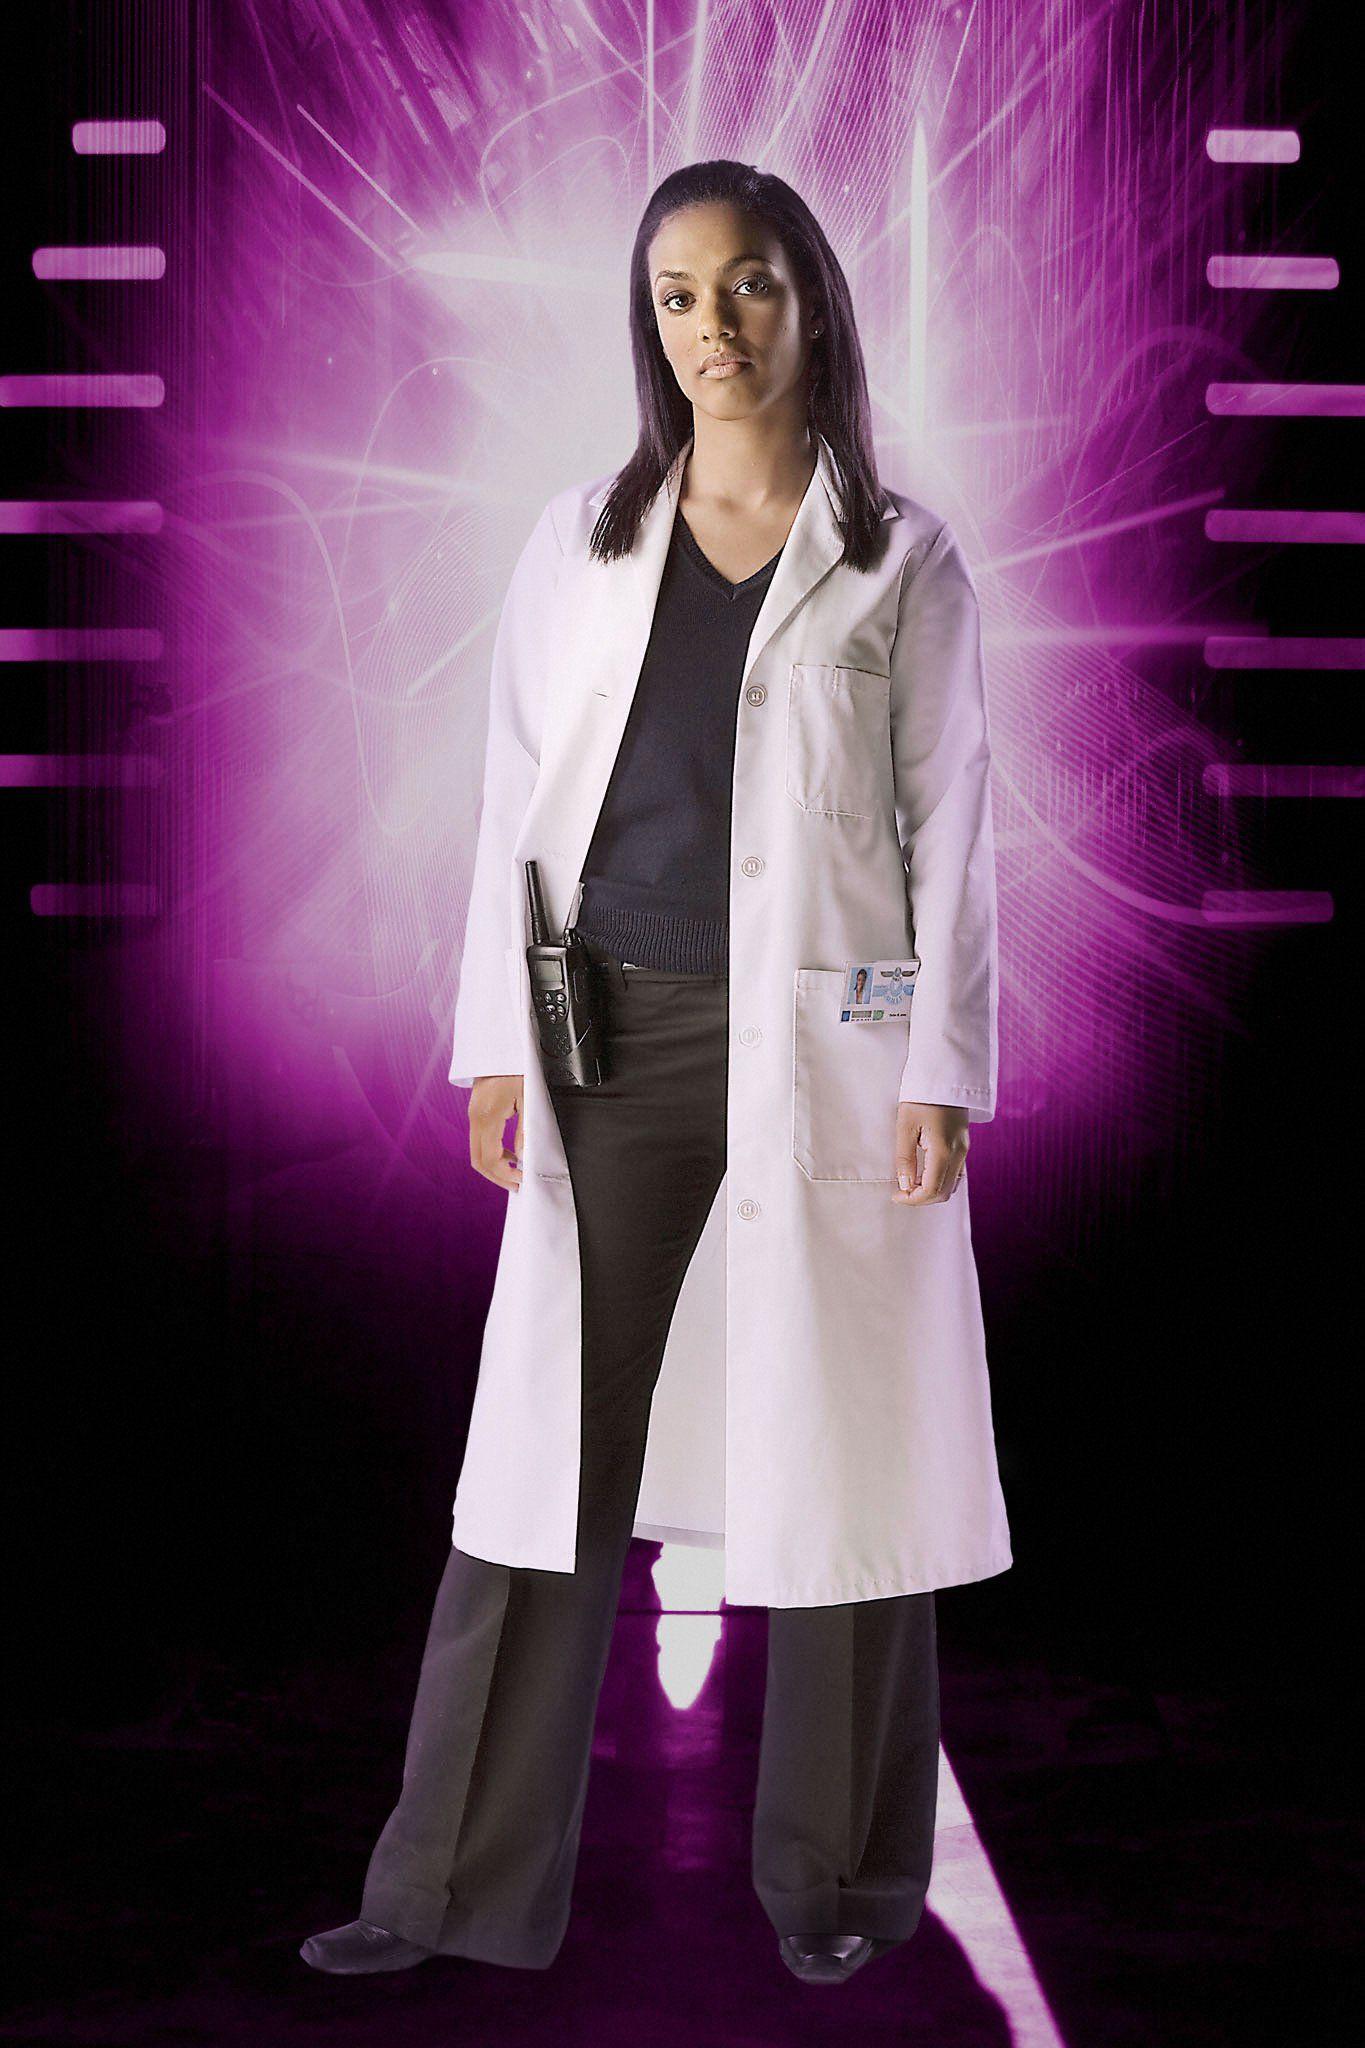 Doctor Who 4x04-05 - The Sontaran Stratagem - The Poison